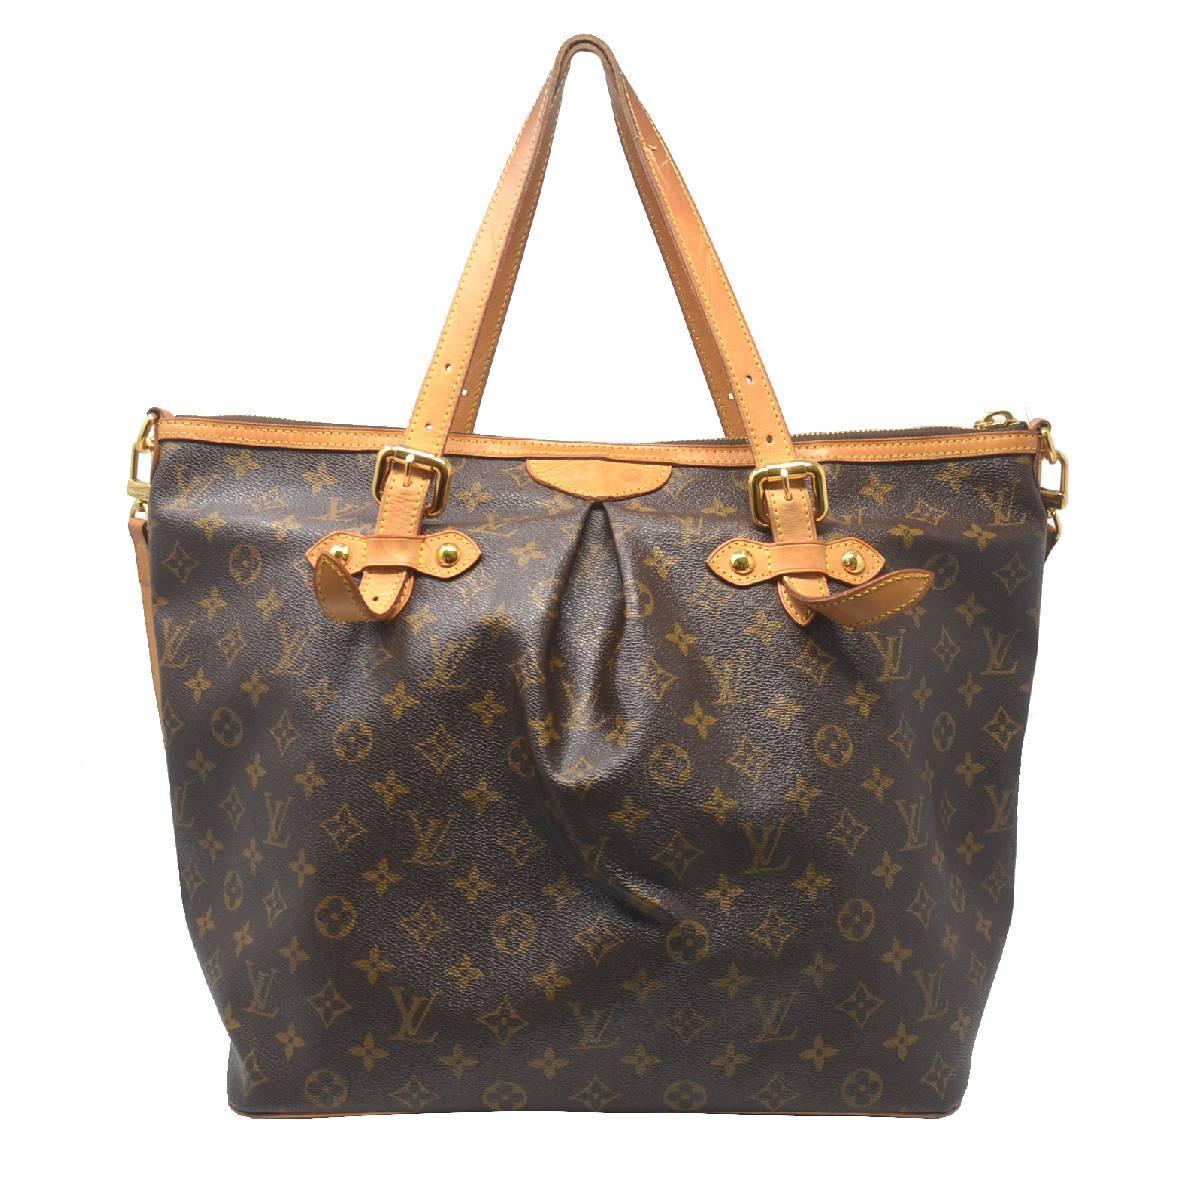 Louis Vuitton Palermo GM Monogram Shoulder Bag